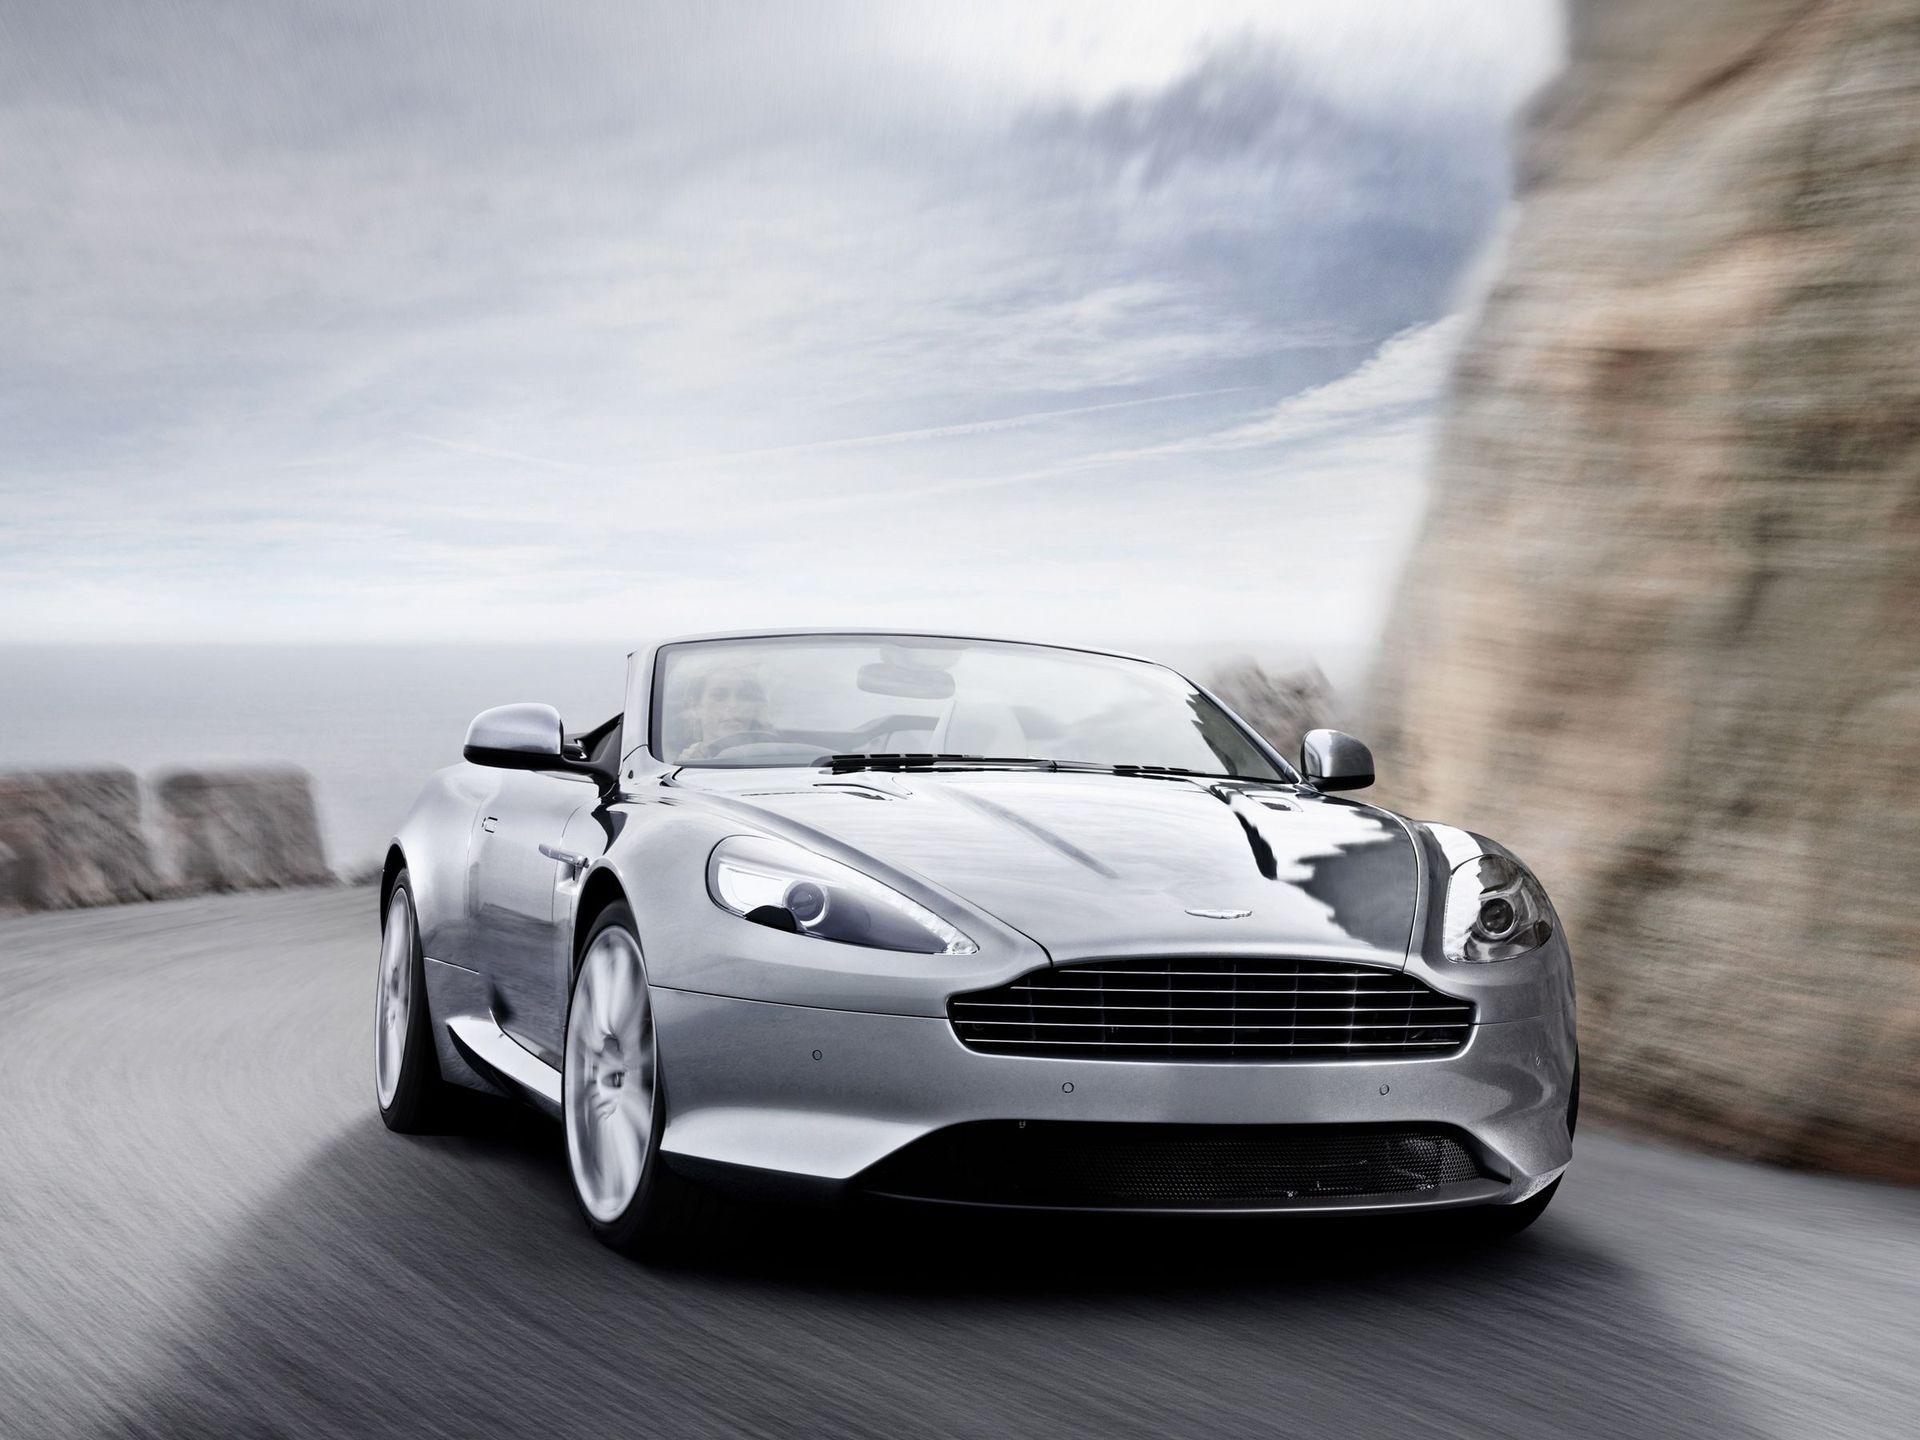 Aston Martin Virage V12 image